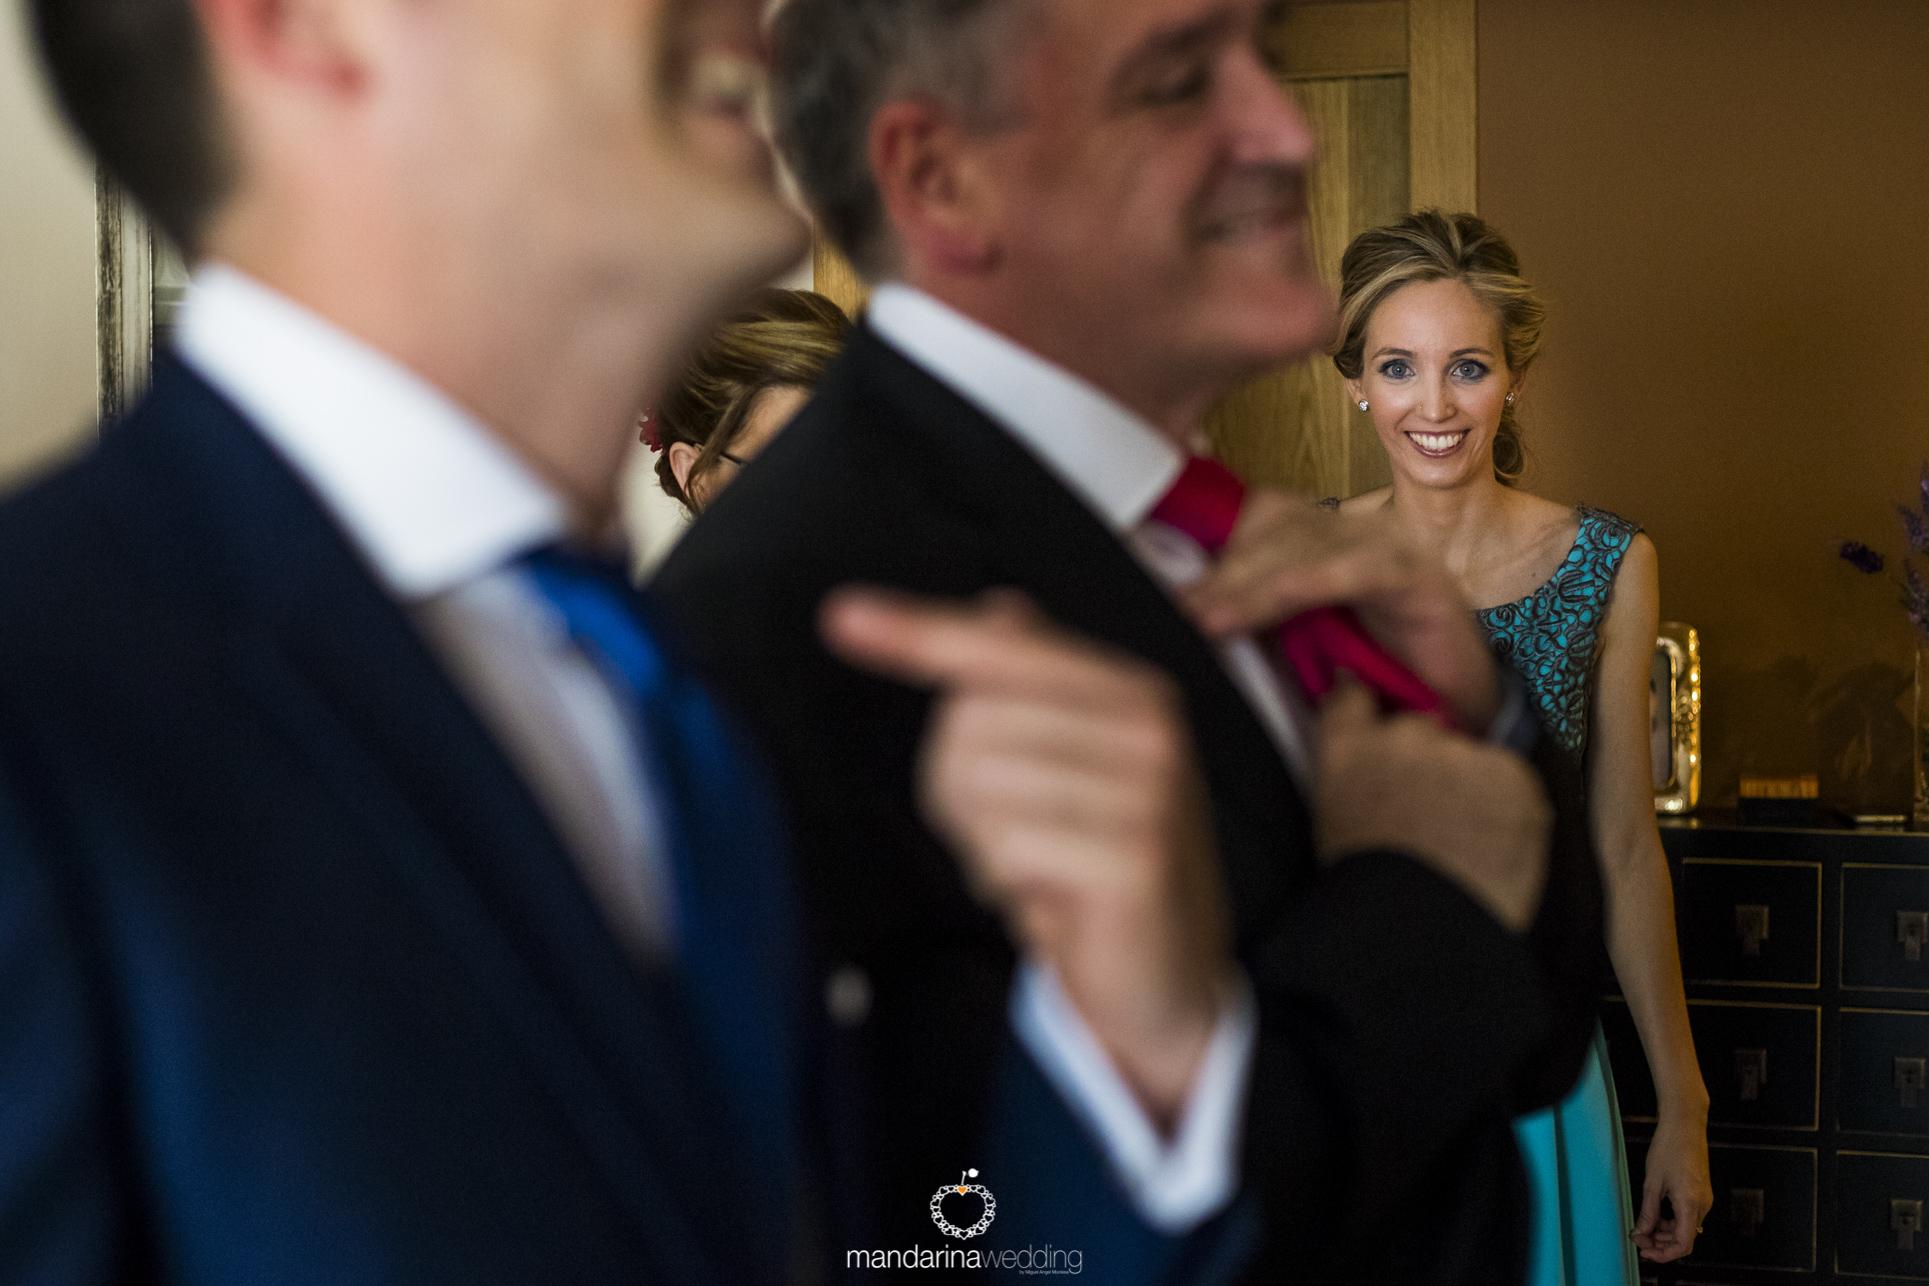 mandarina wedding, fotografo boda pais vasco, fotografo boda zaragoza, fotógrafo boda soria, fotografo boda Madrid, fotógrafo boda tarragona-31